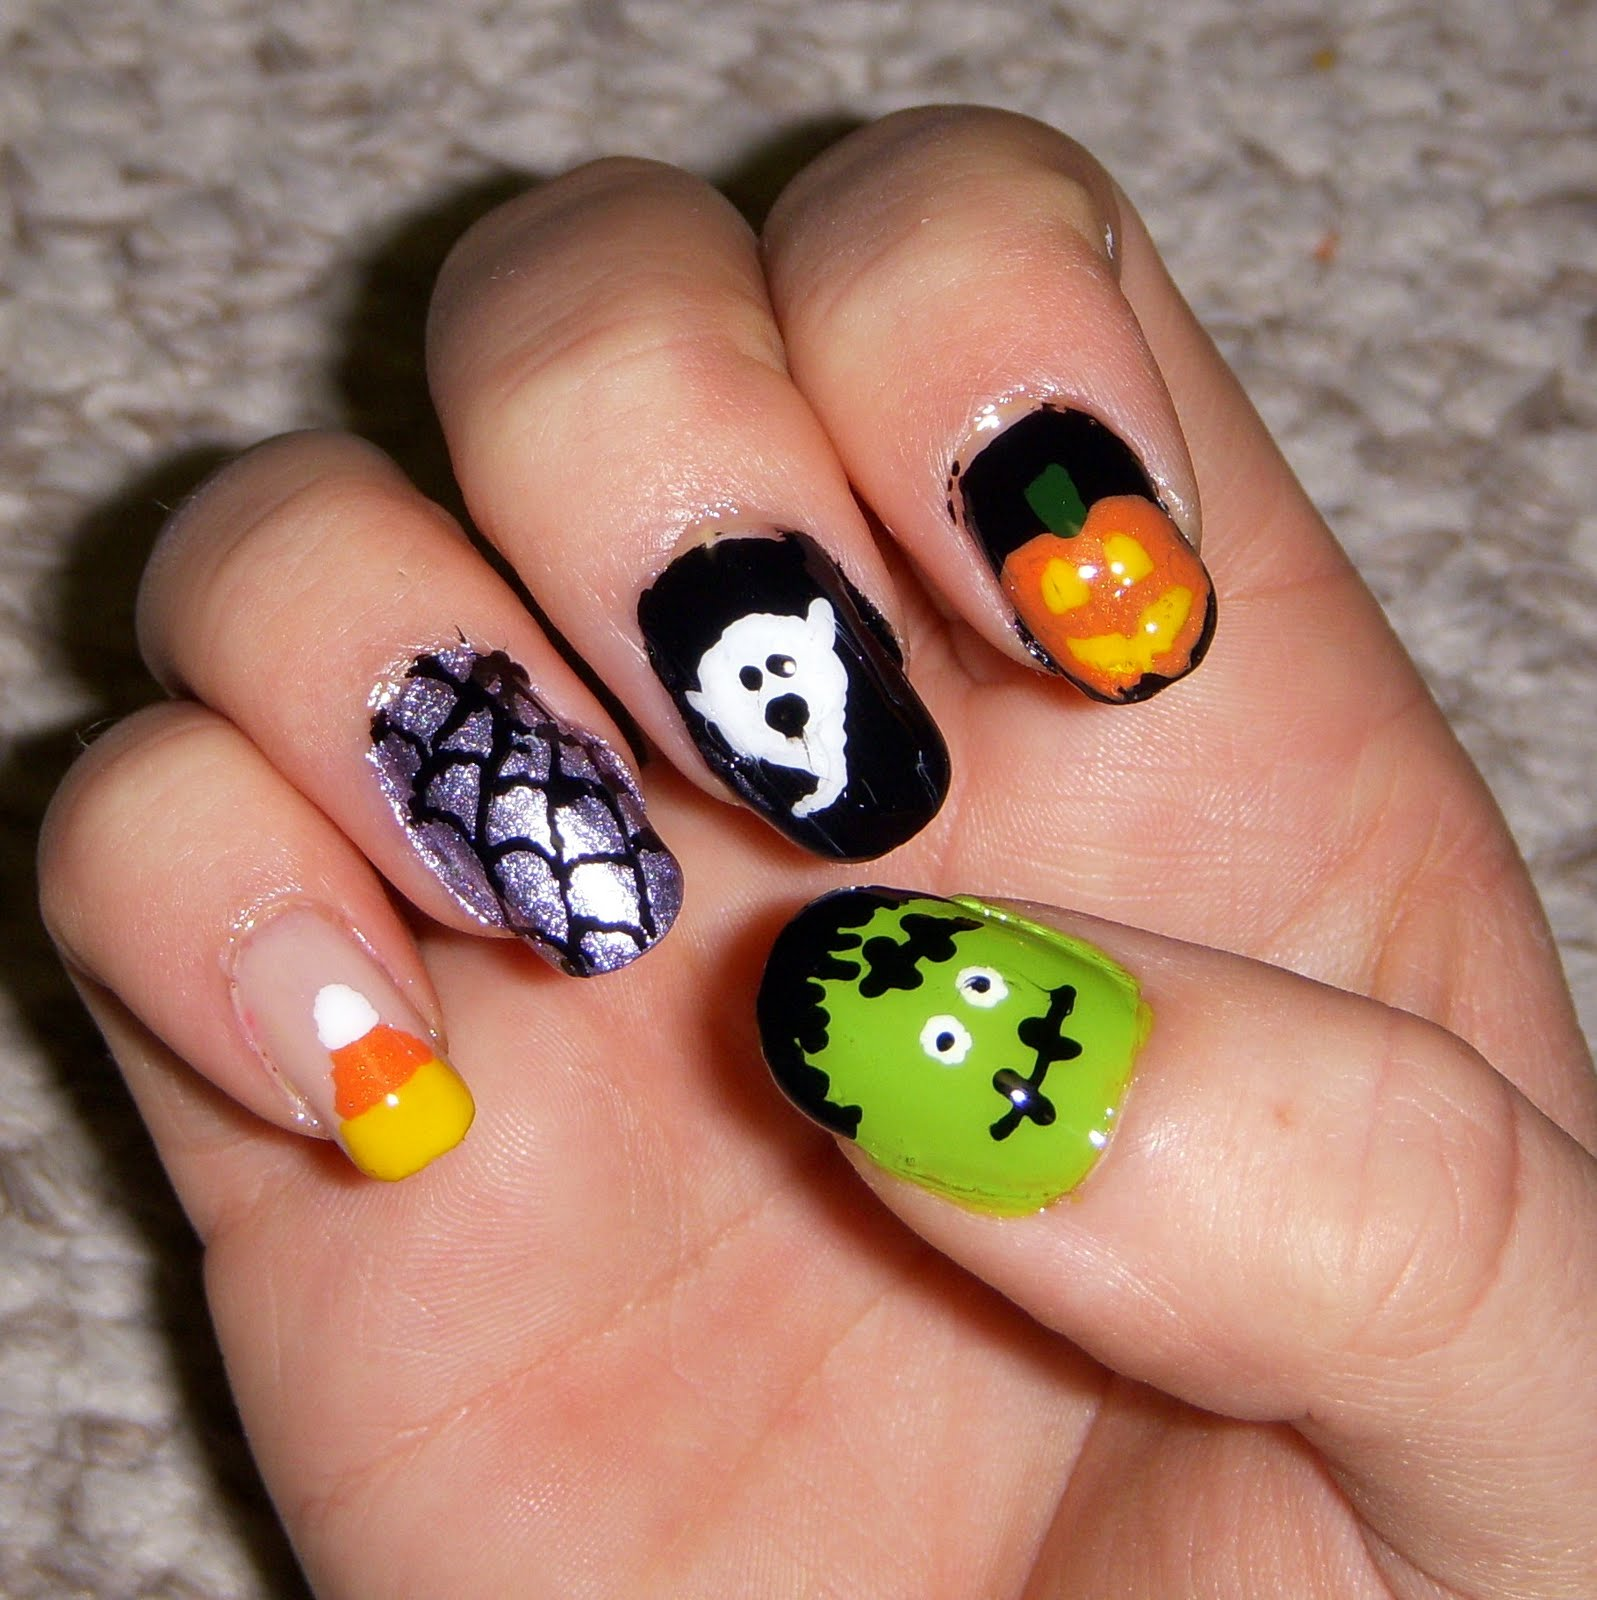 Quixii's Nails: 10/28/11 - Halloween Nails